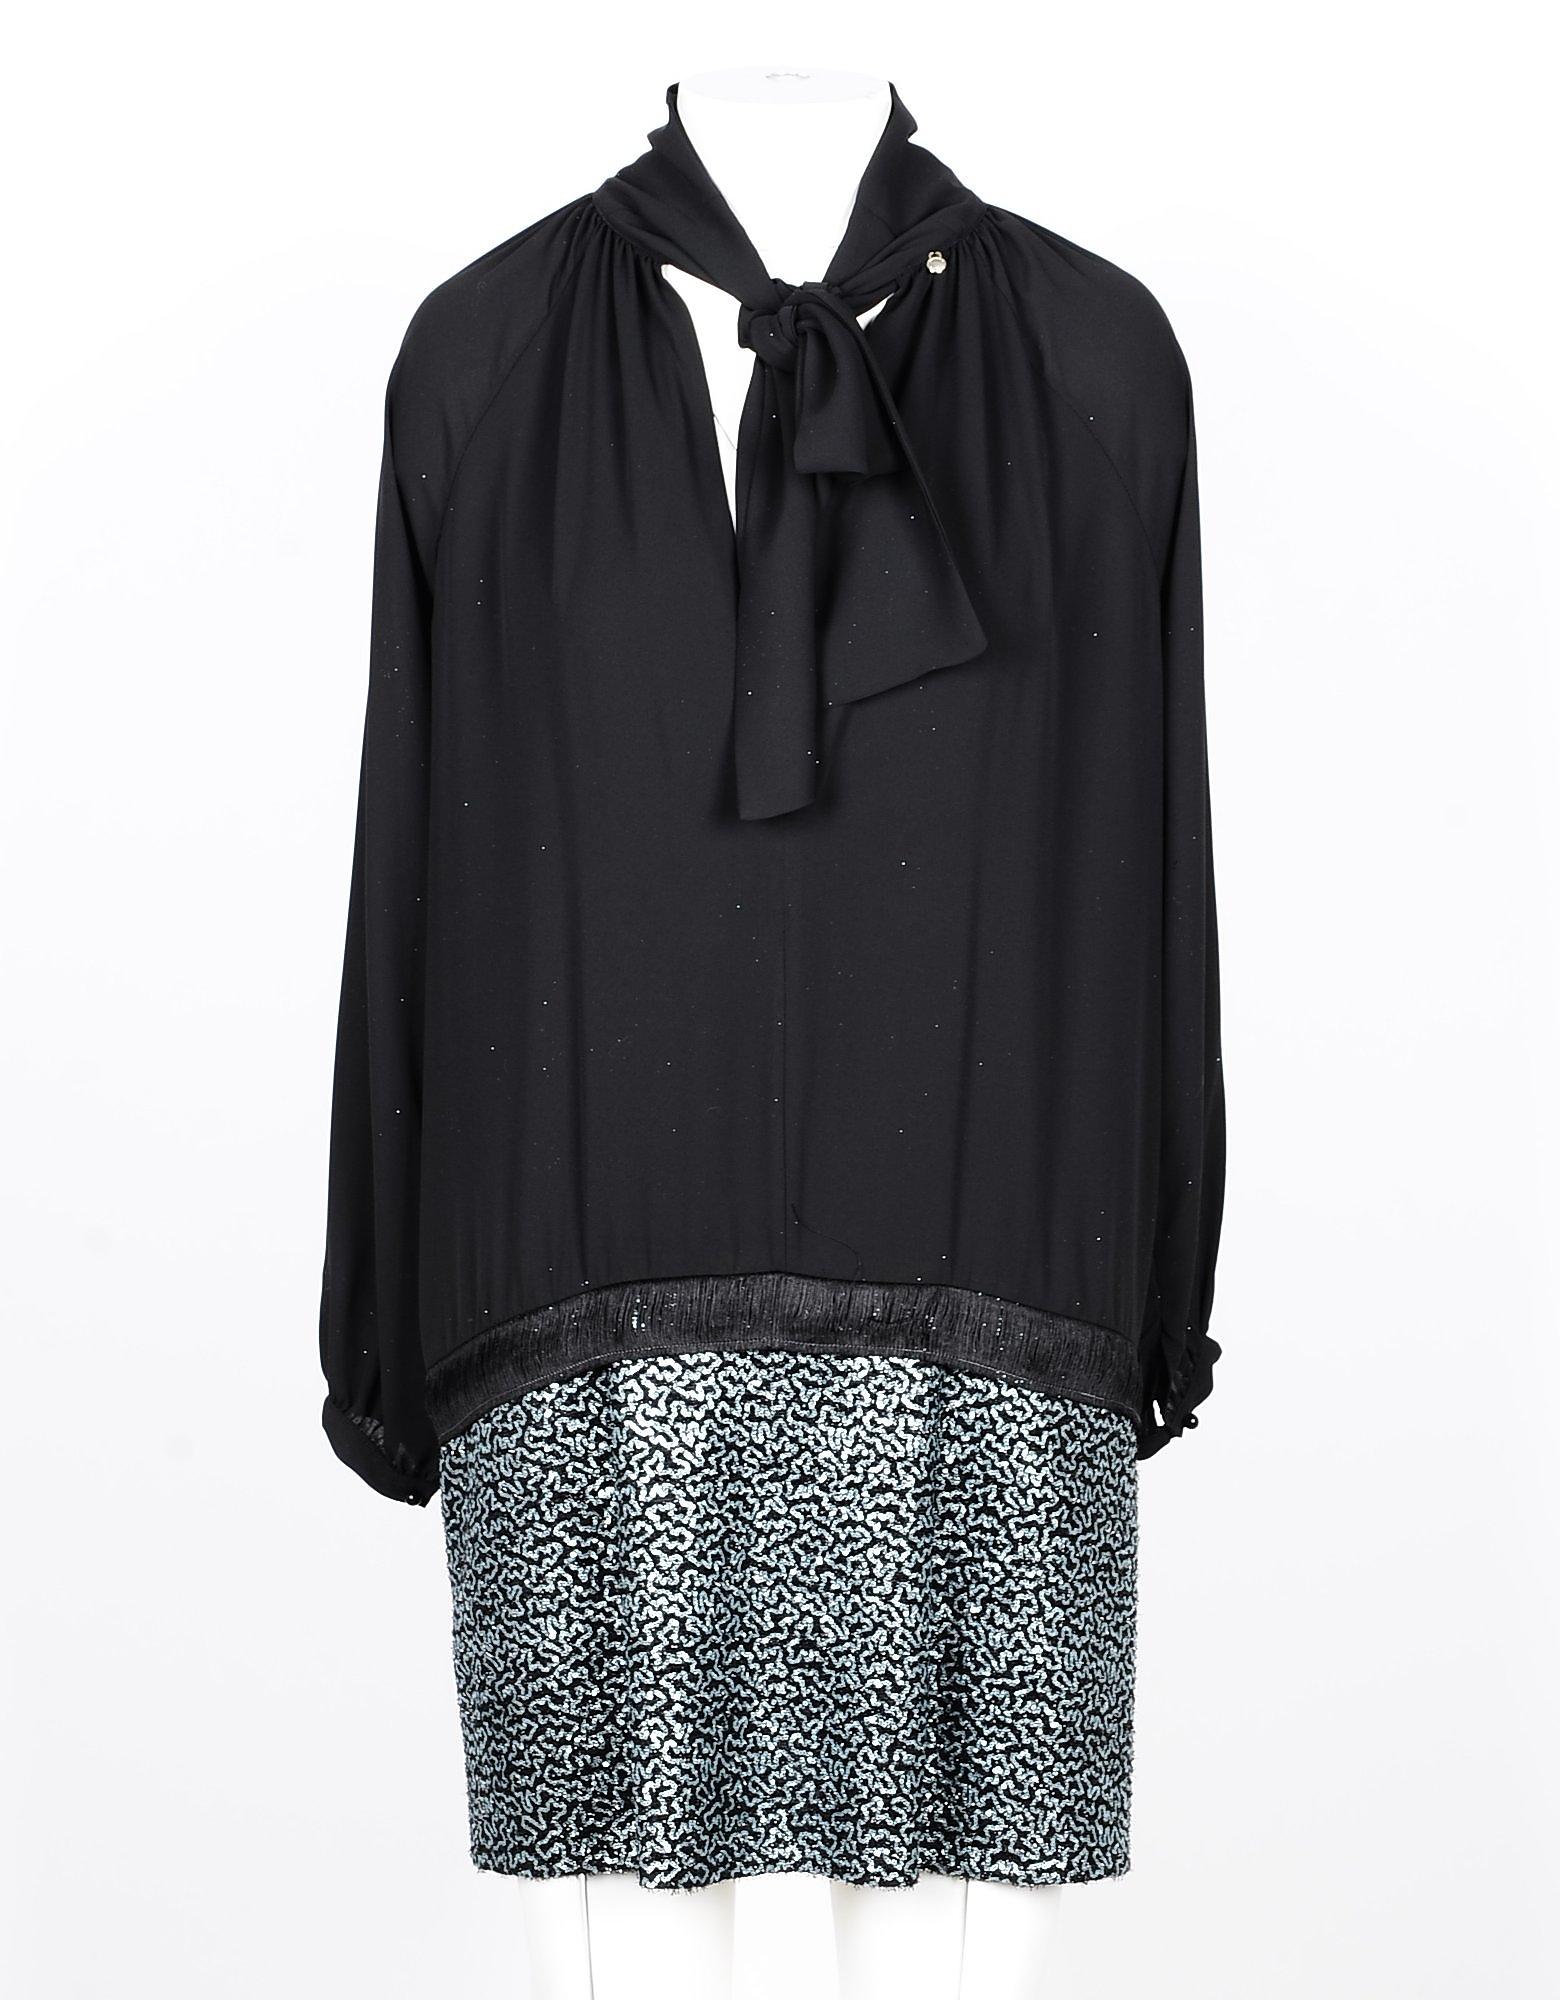 Annarita N Designer Dresses & Jumpsuits, Black Women's Mini Dress